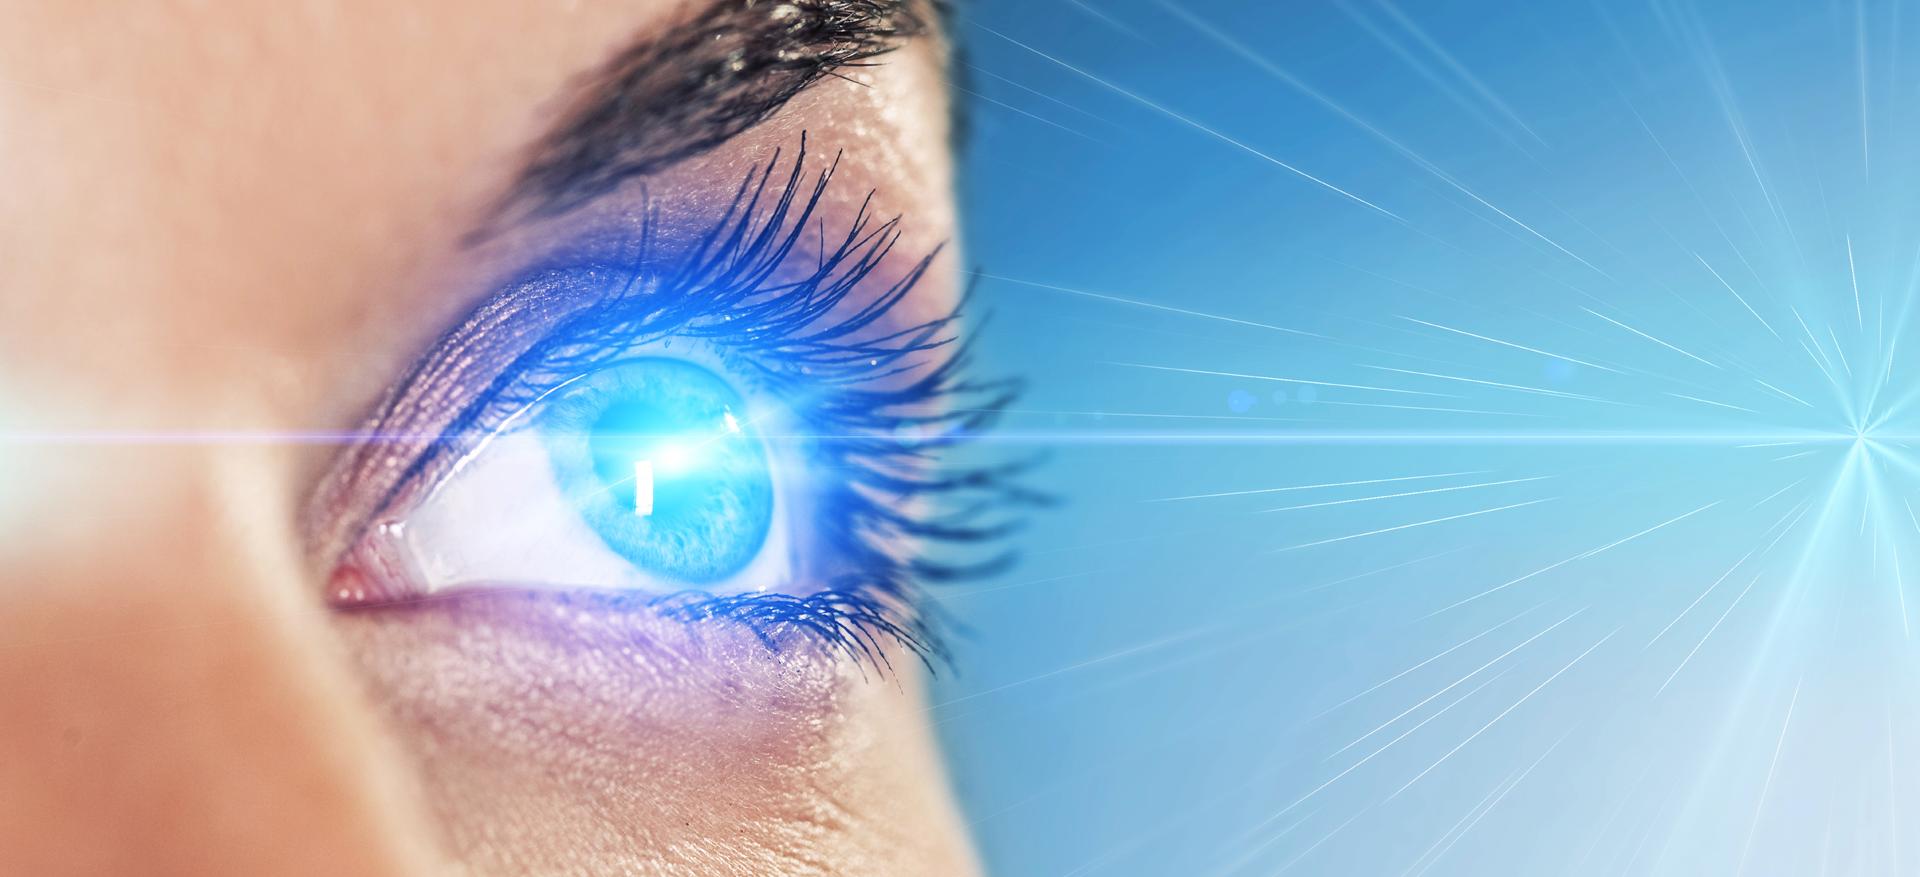 Vantagens da Cirurgia de Olhos a Laser